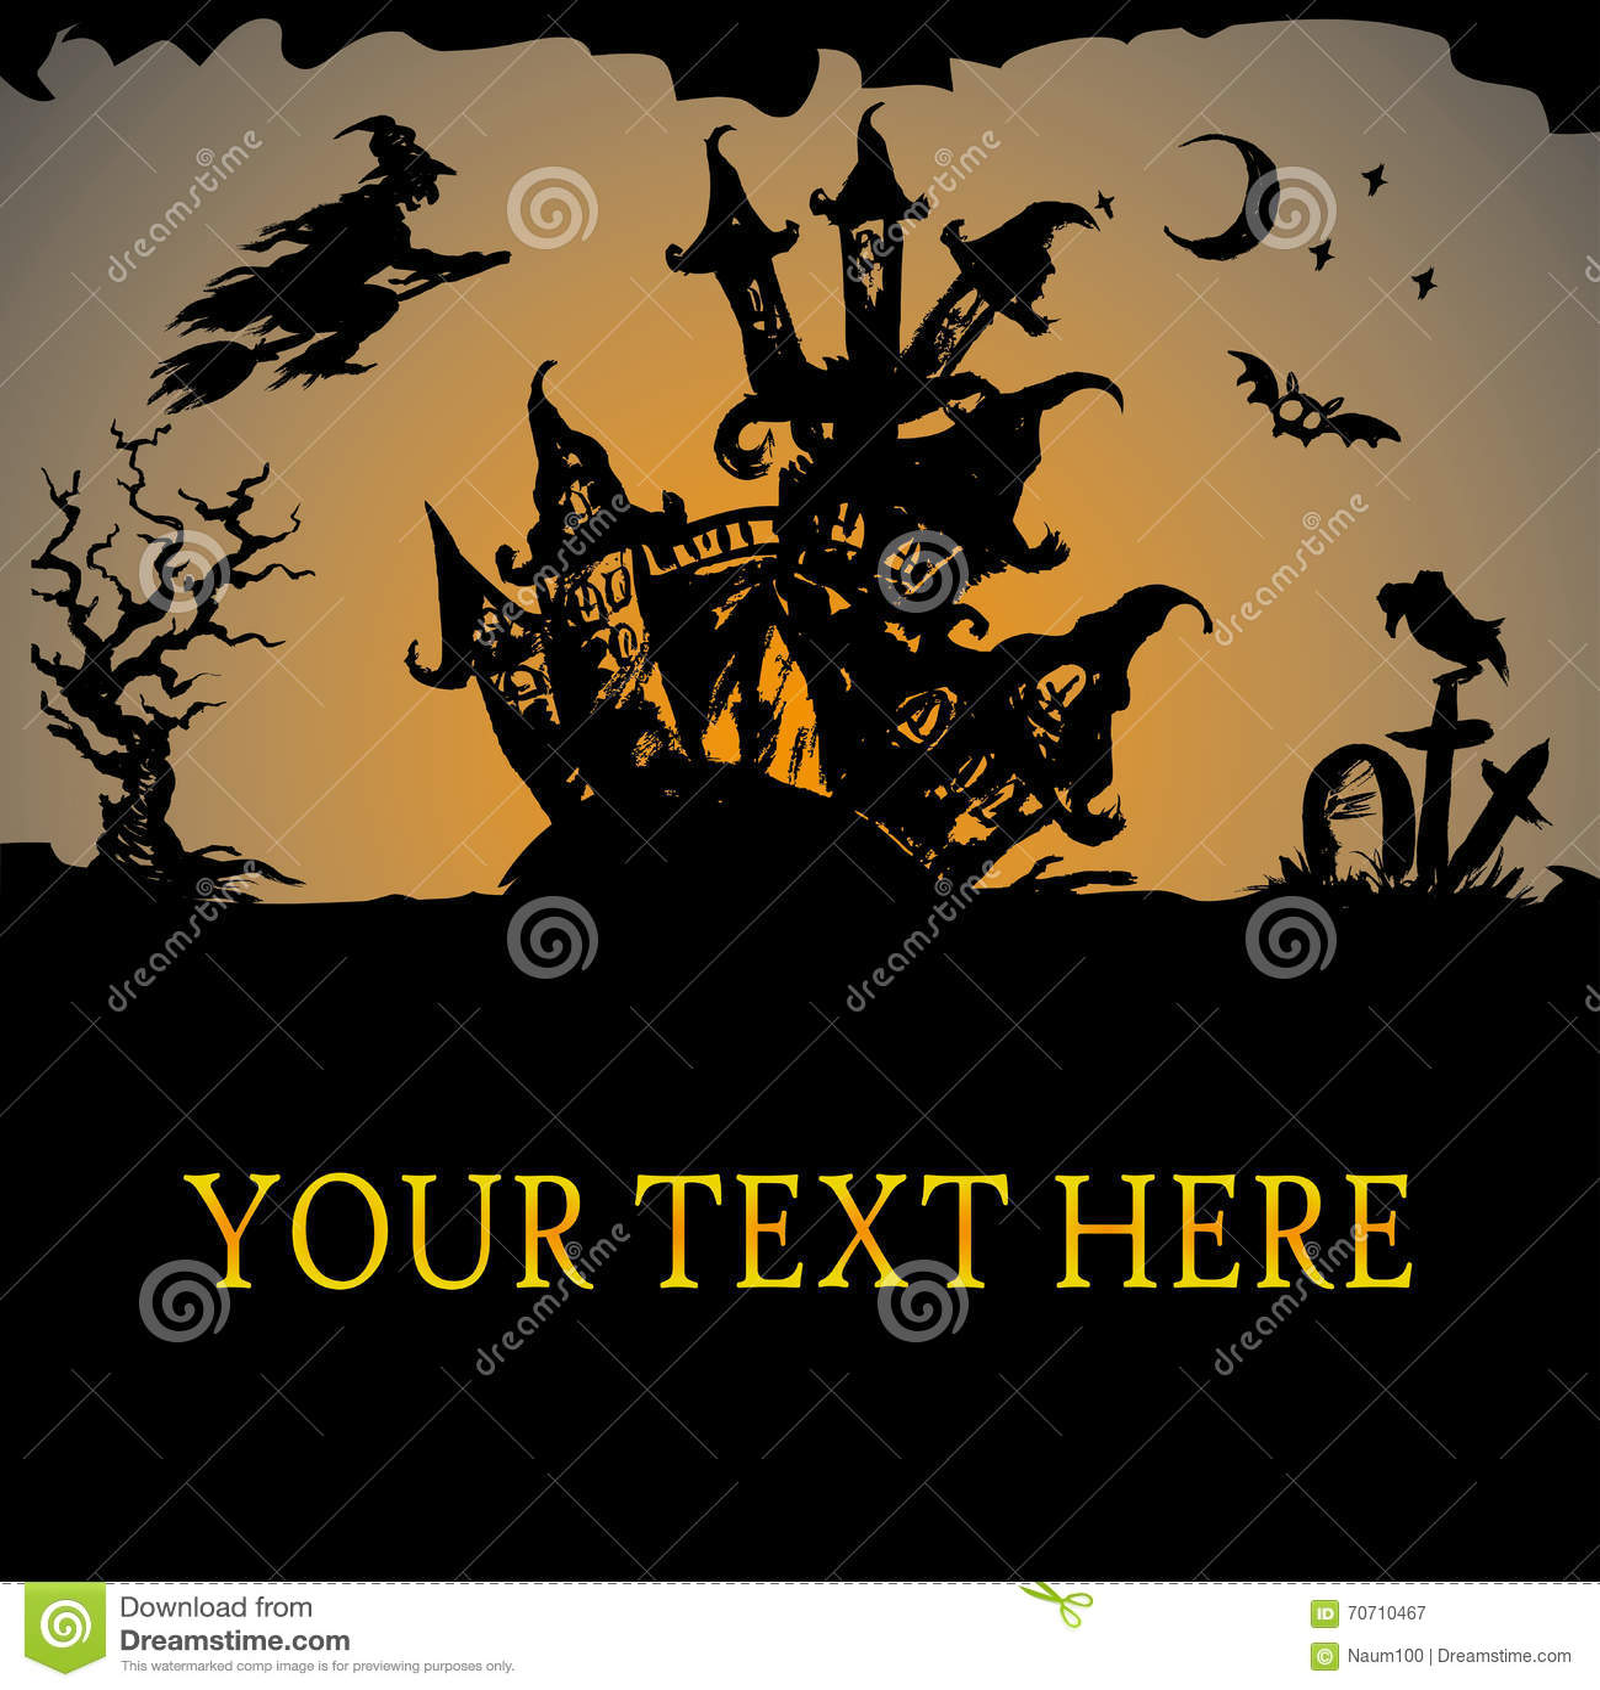 Halloween Haunted House Stock Vector - Image: 70710467